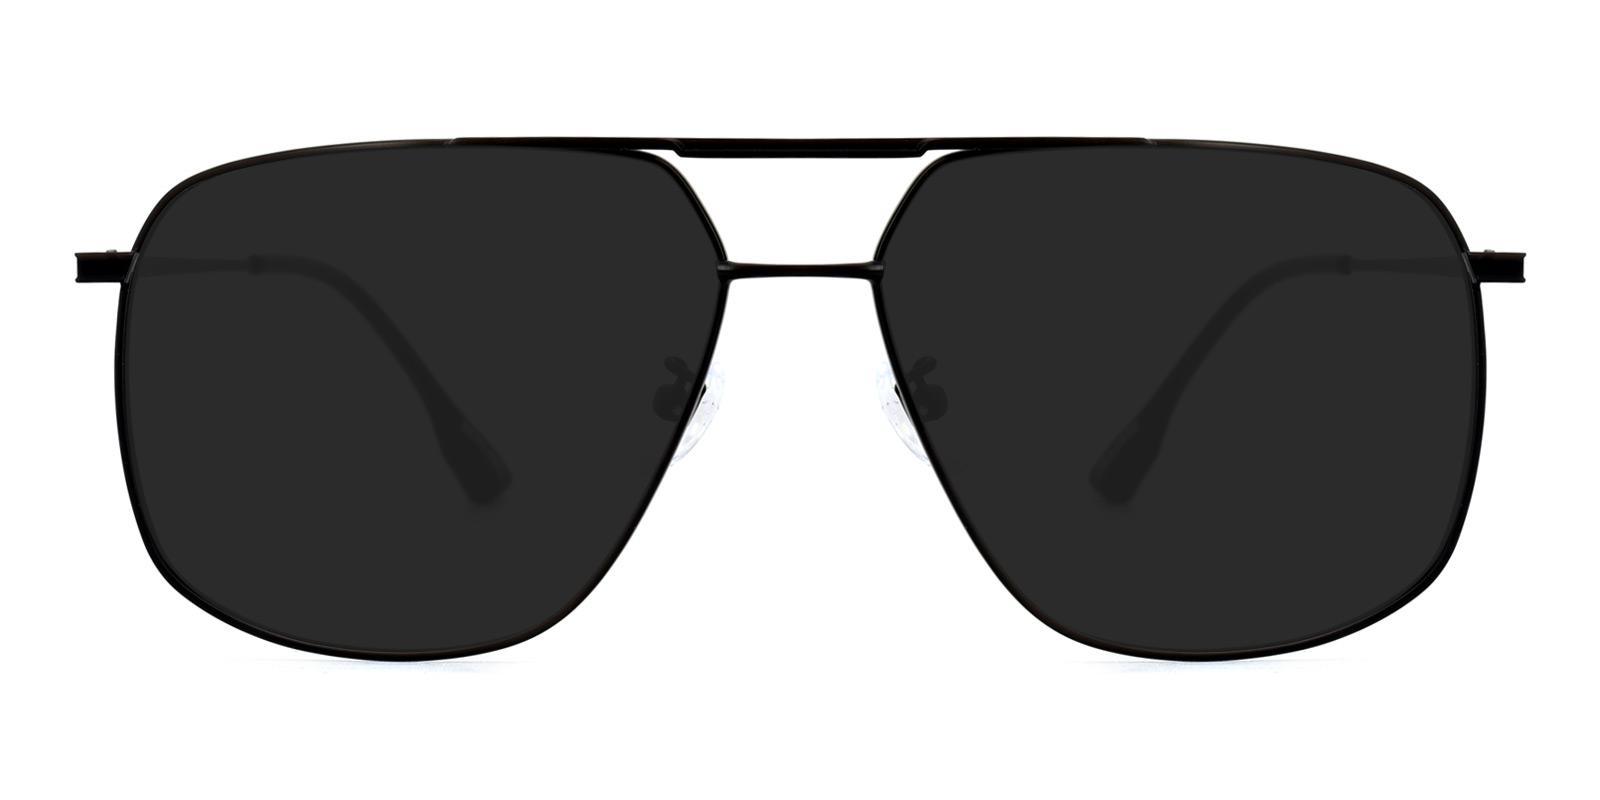 Apollo-Black-Aviator-Metal-Sunglasses-detail